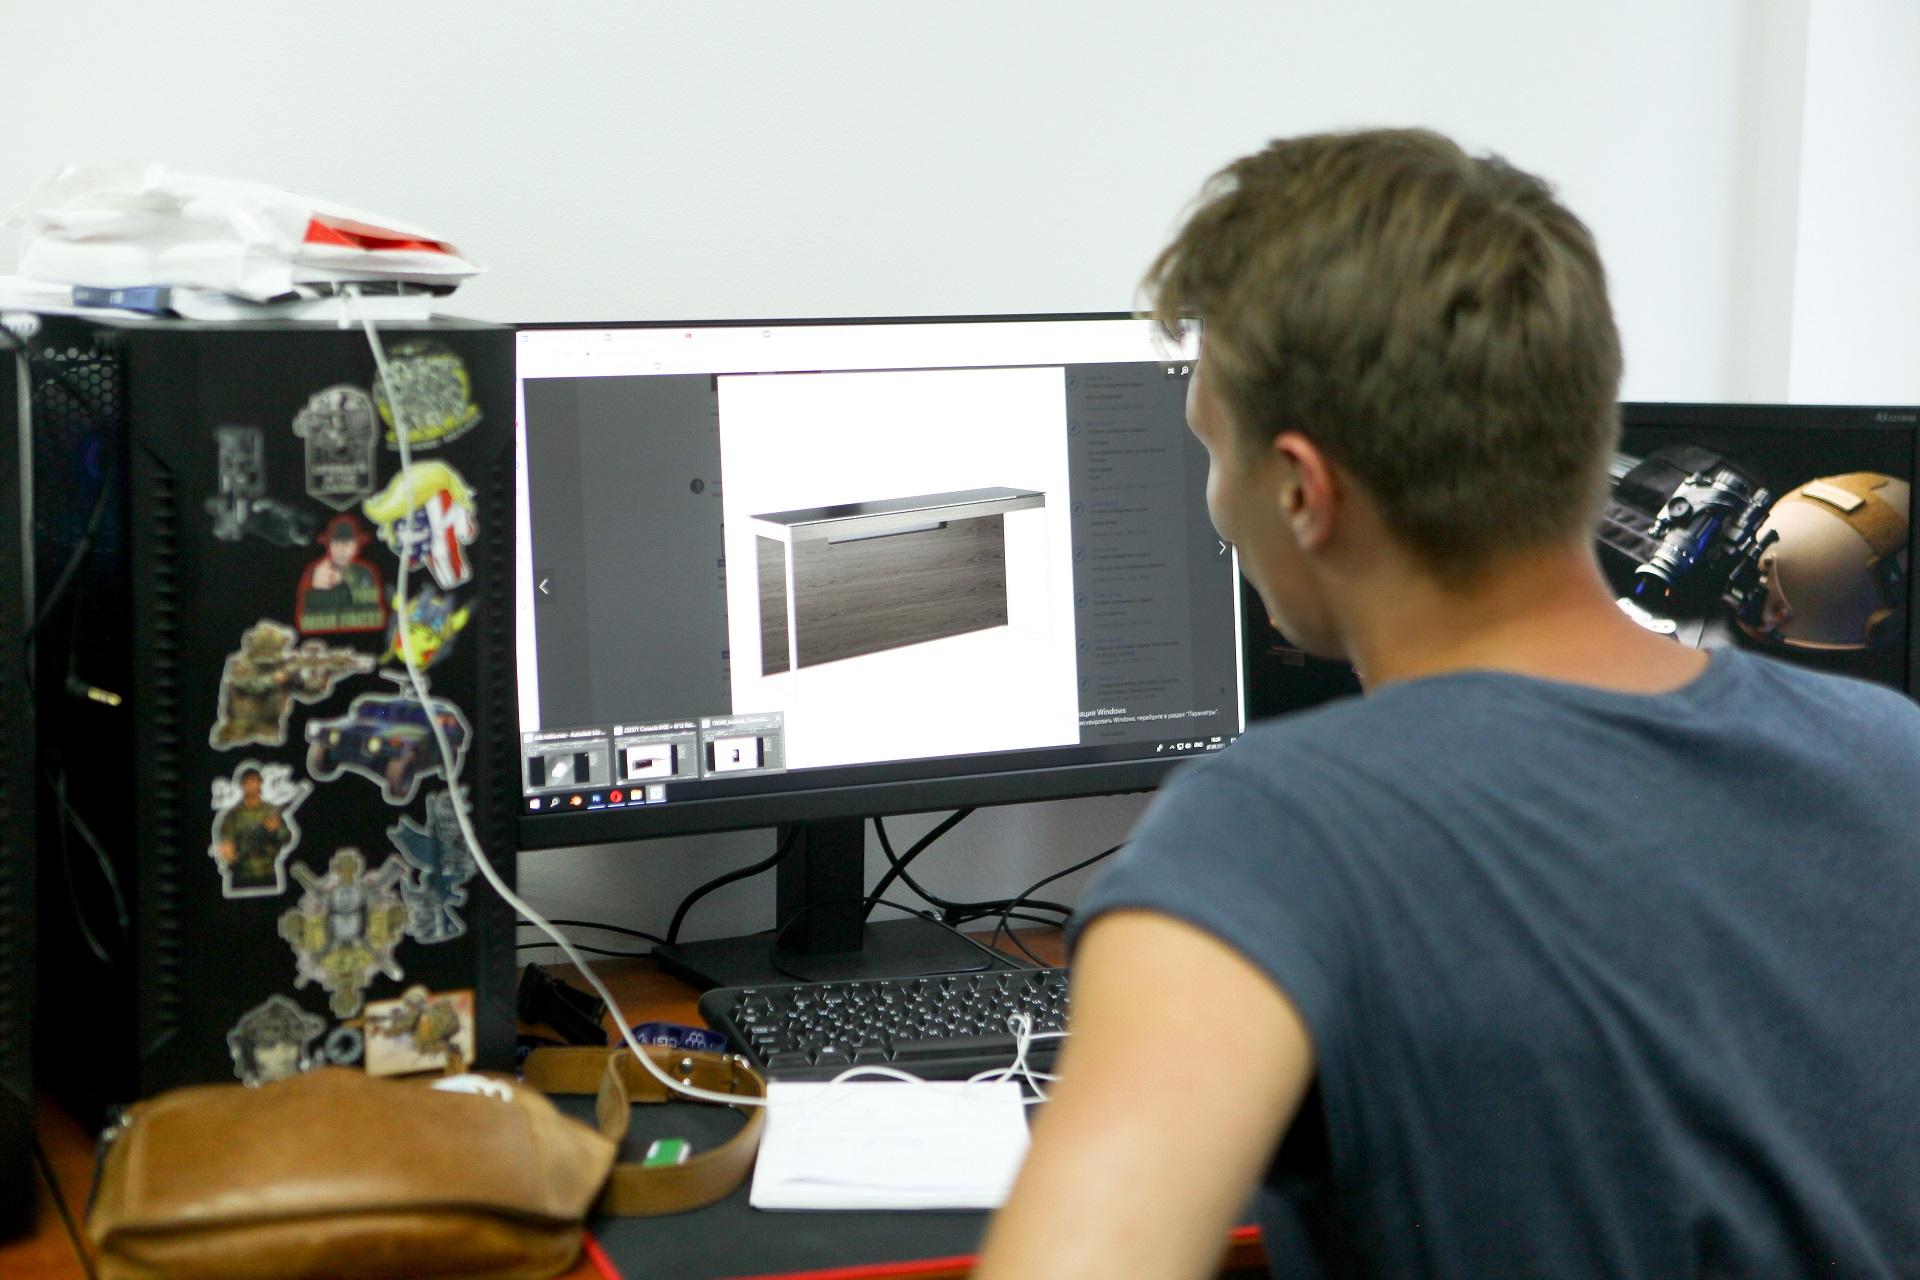 3D визуализатор в процессе работы